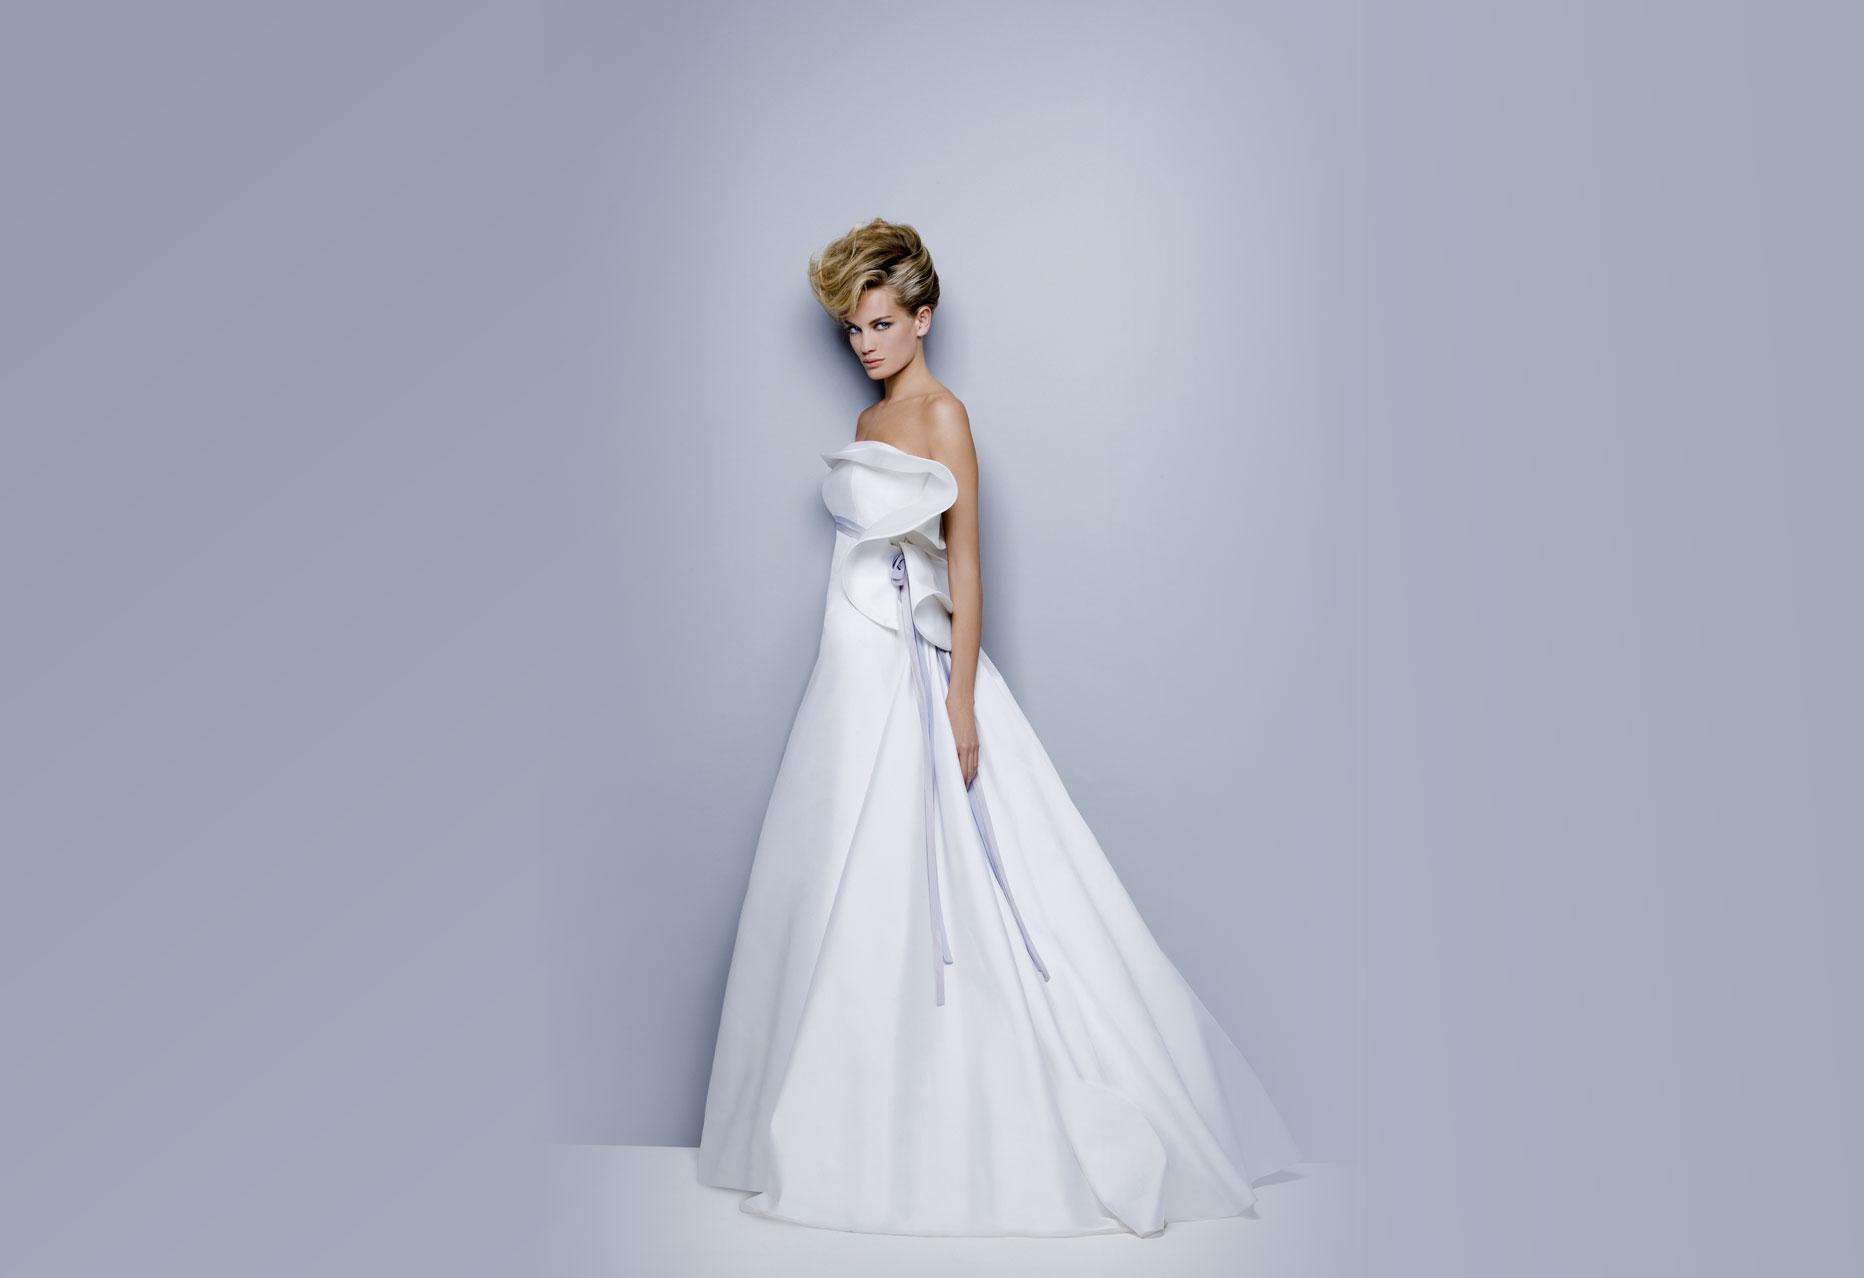 Pure Italian Silk Wedding Dresses from Antonio Riva 5